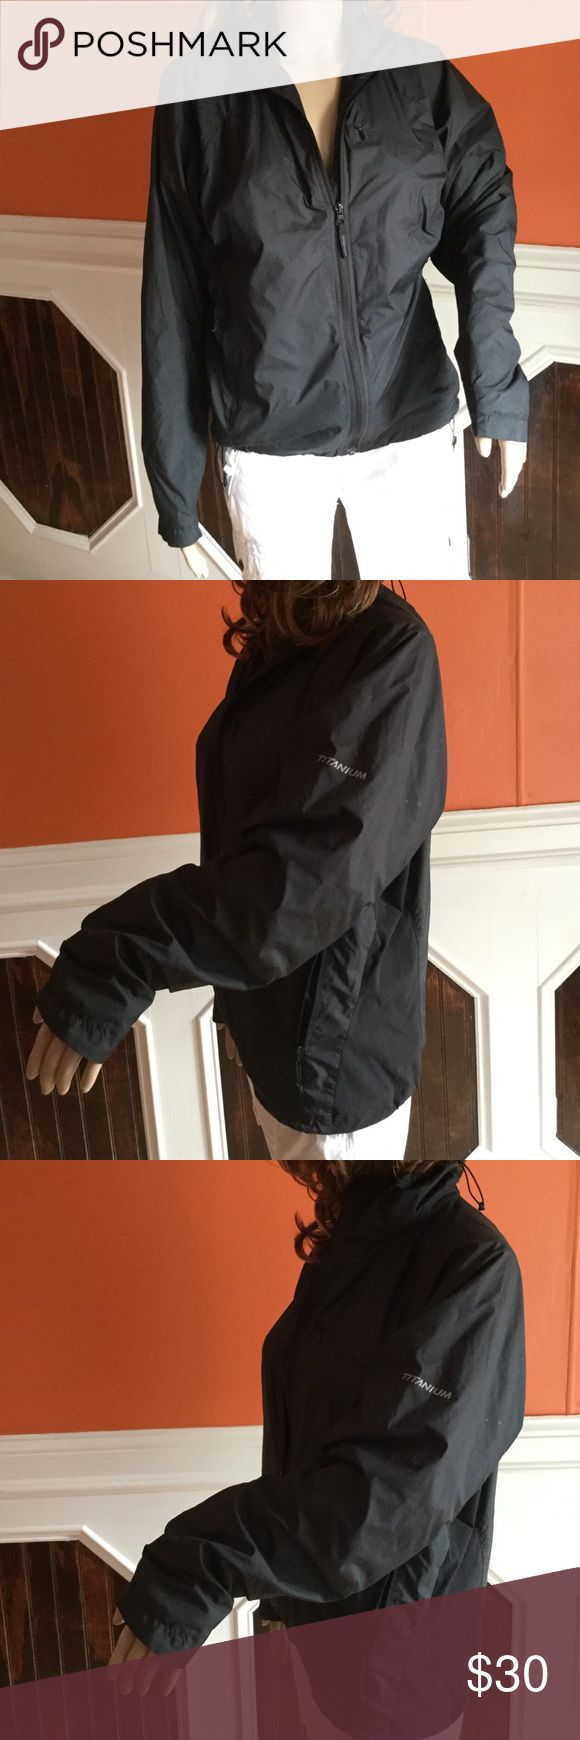 Columbia titanium sportswear company jacket Great condition Columbia Jackets & Coats